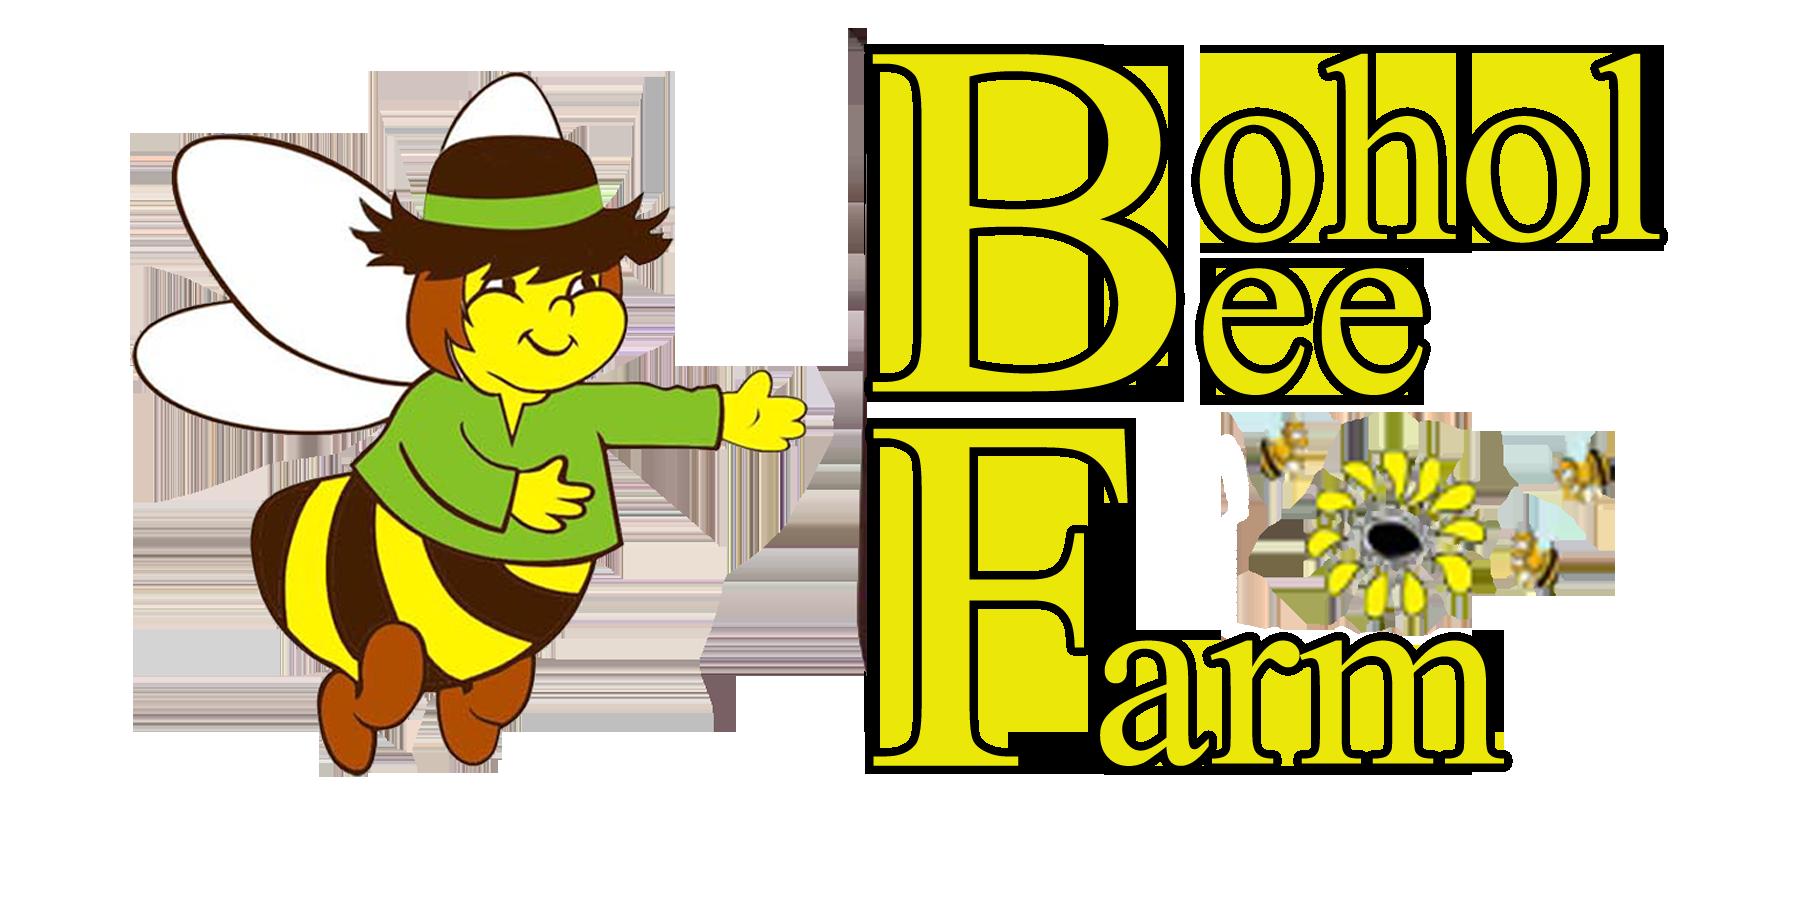 Bohol Bee Farm | phiippines | Pinterest | Bee farm, Bohol and Pure honey